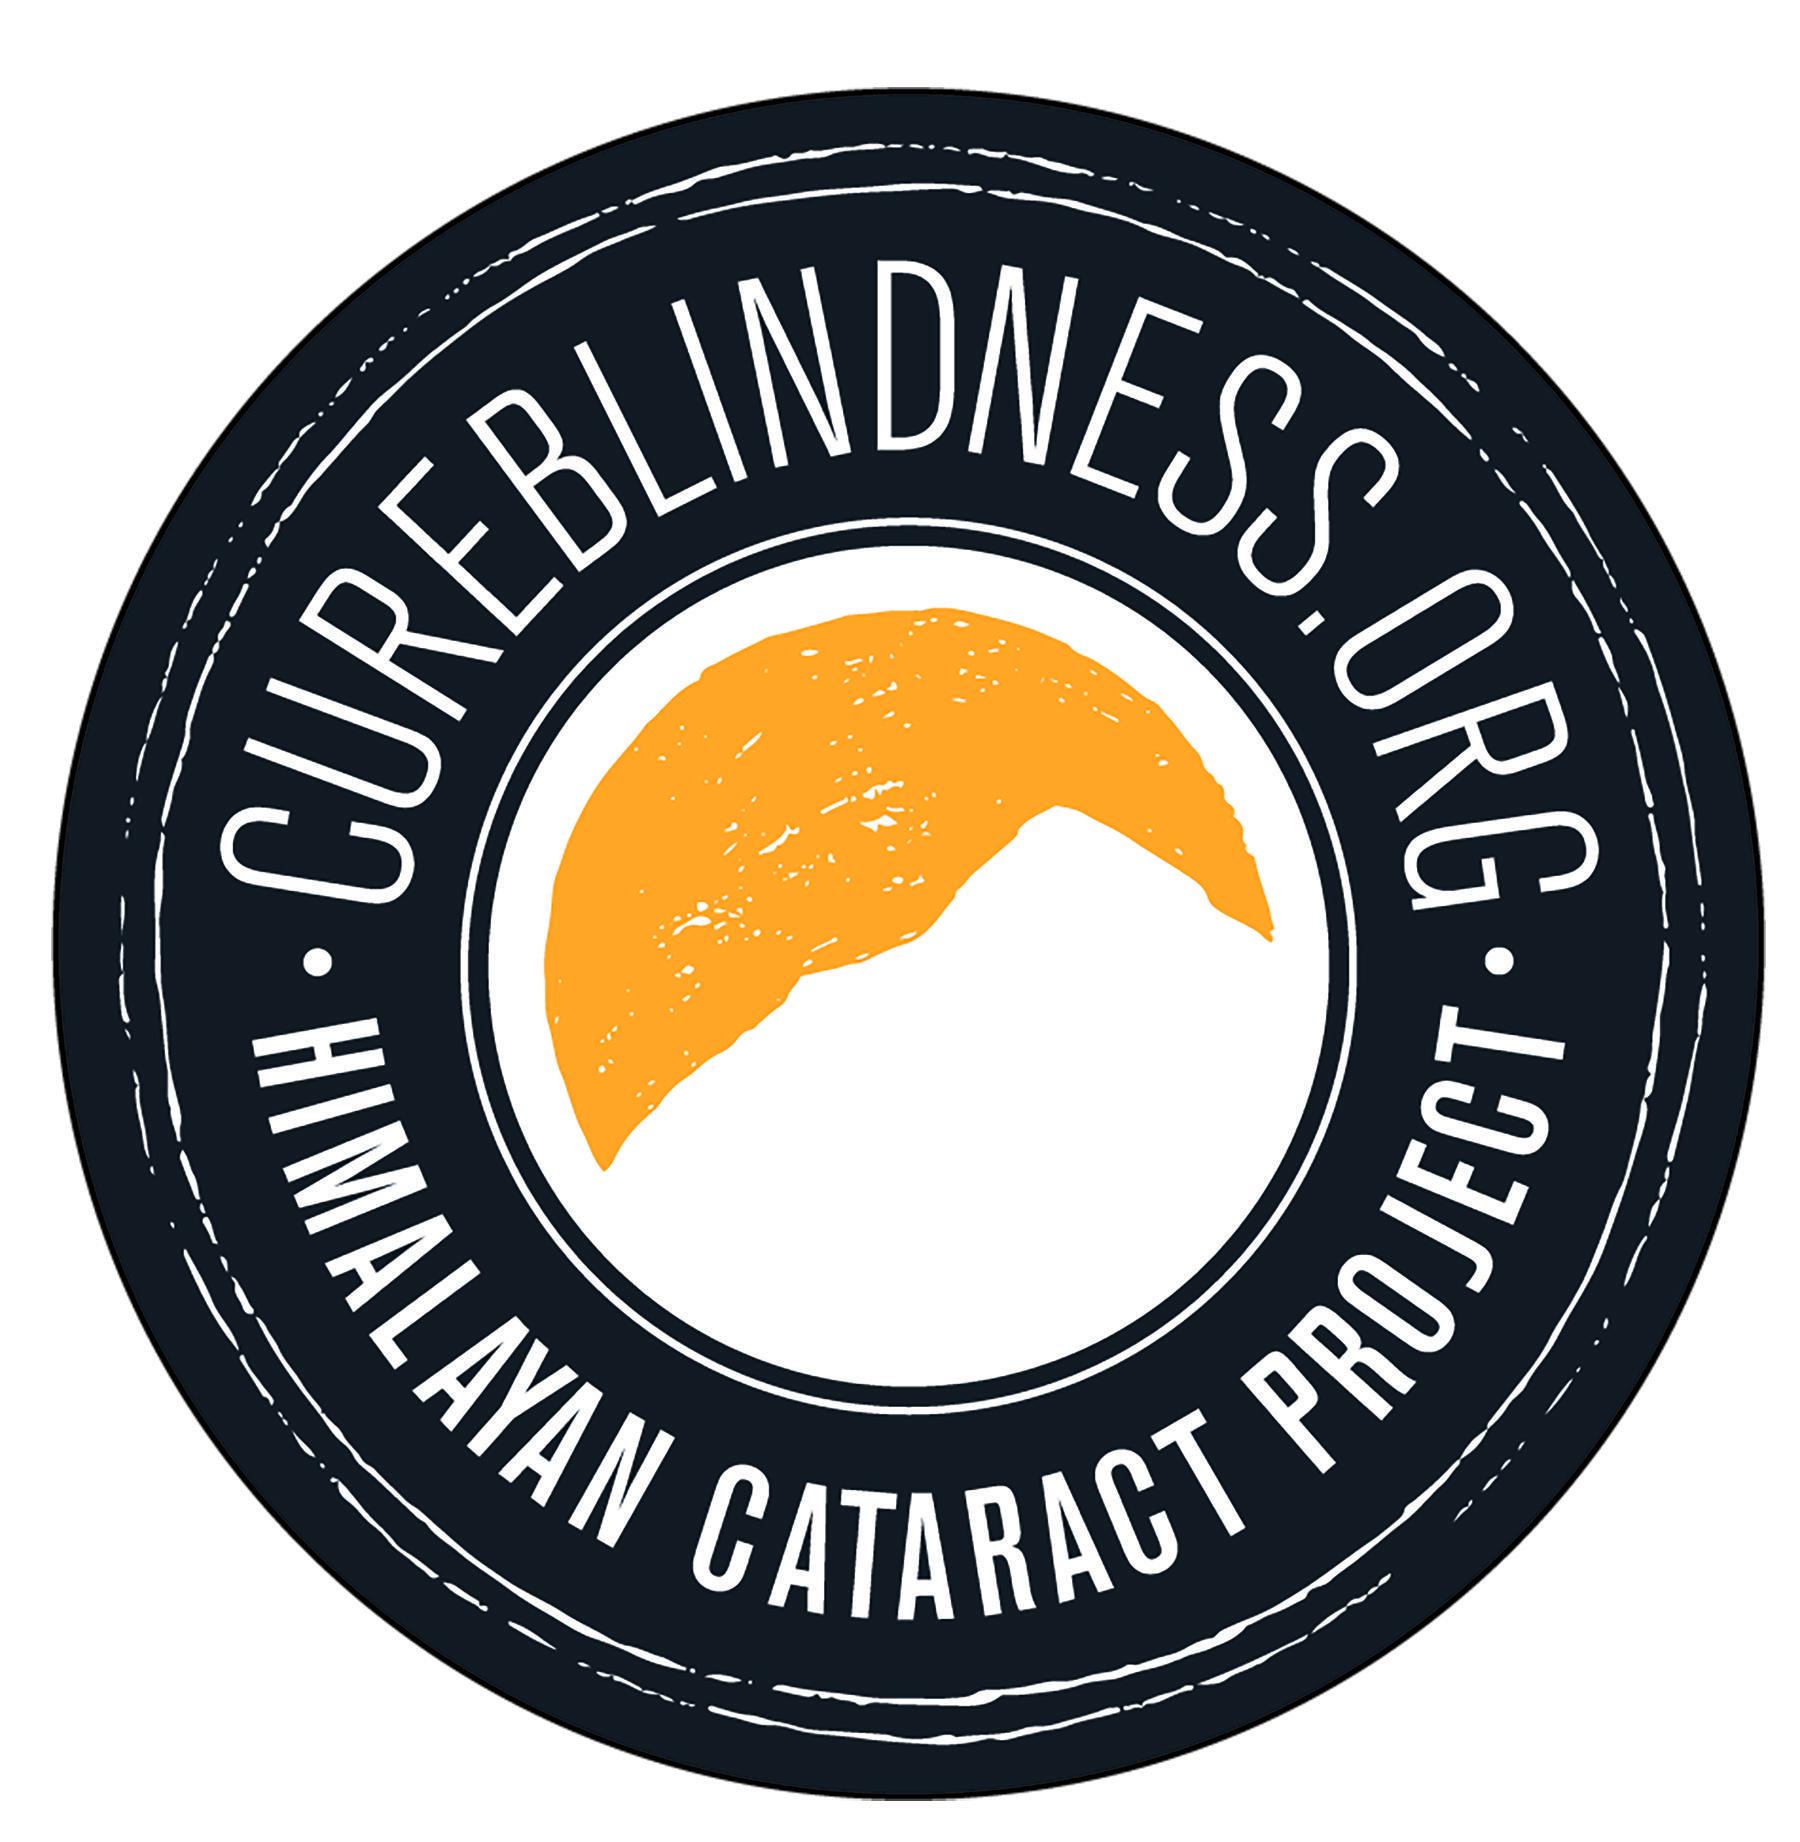 Himalayan Cataract Project